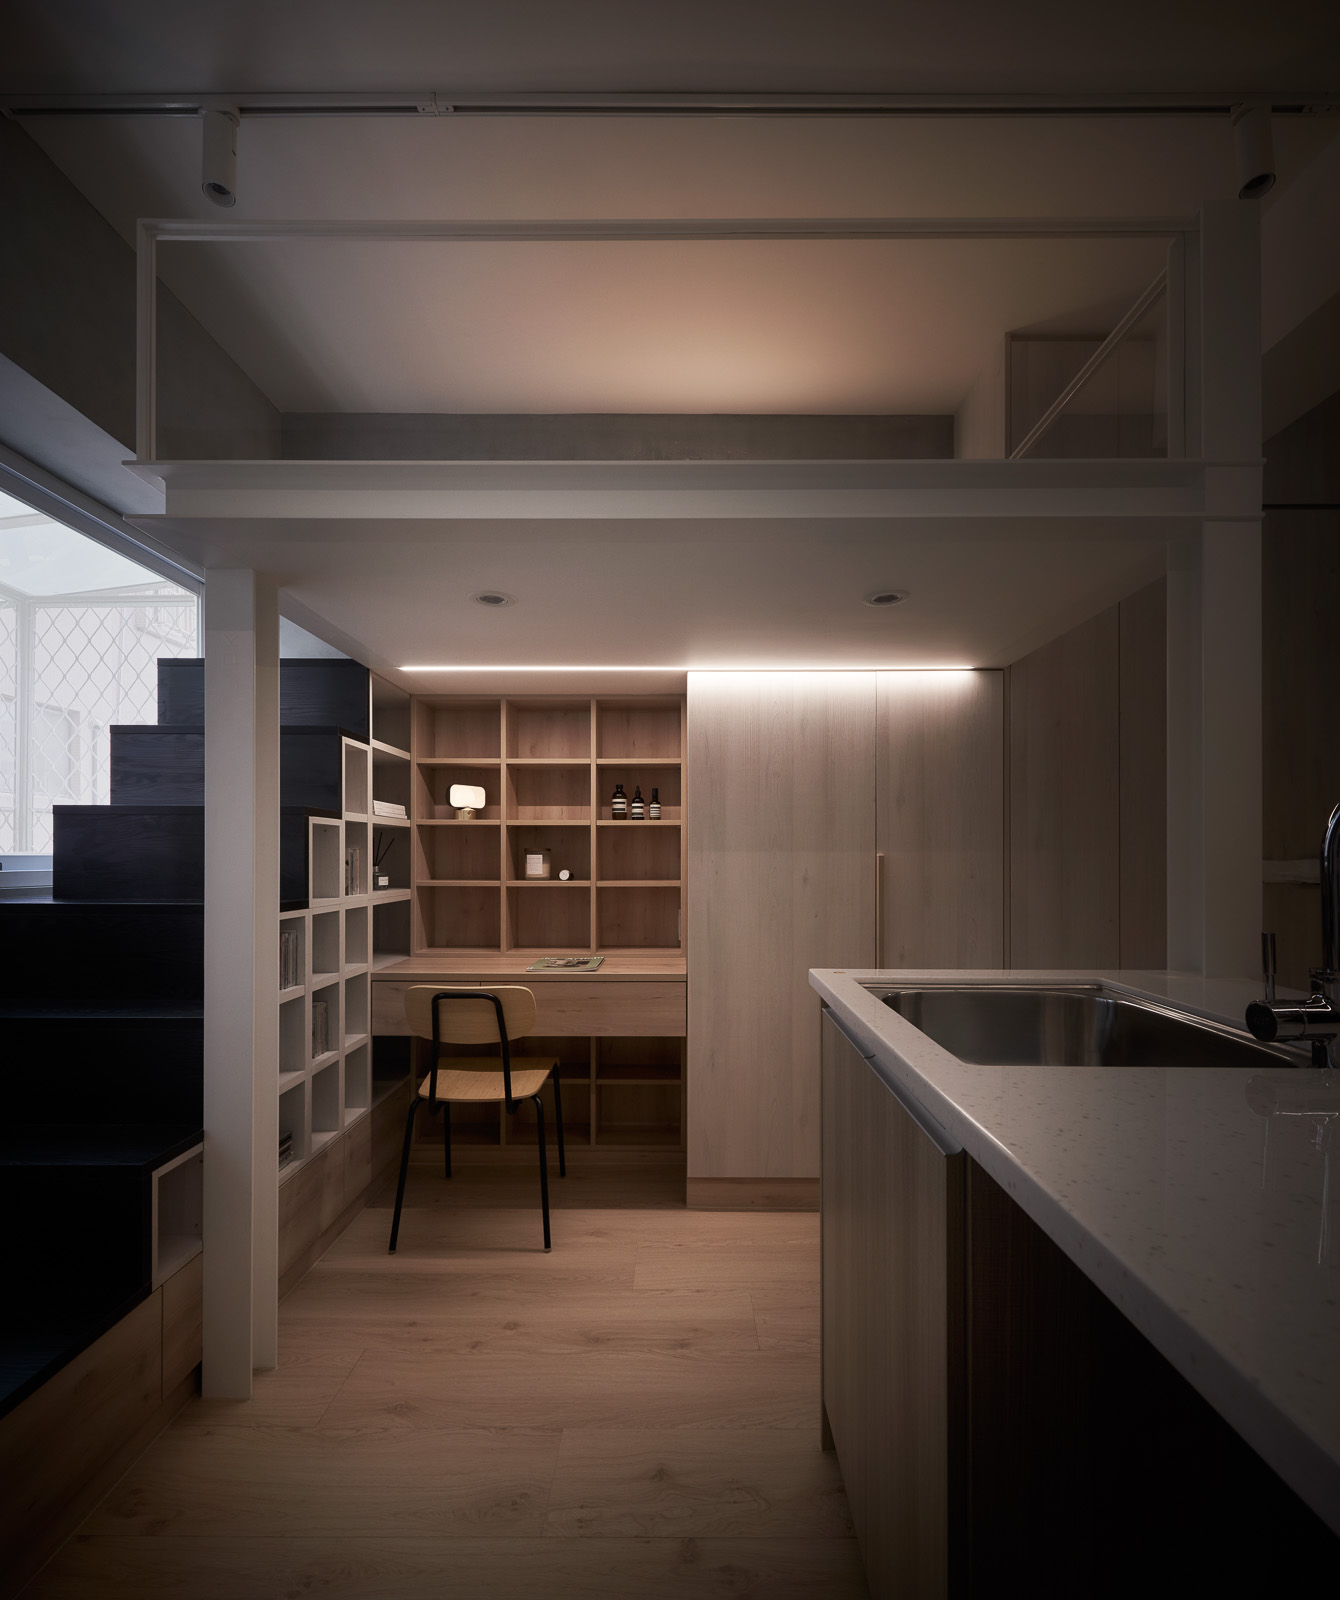 NestSpace_SmallHouse_S-106